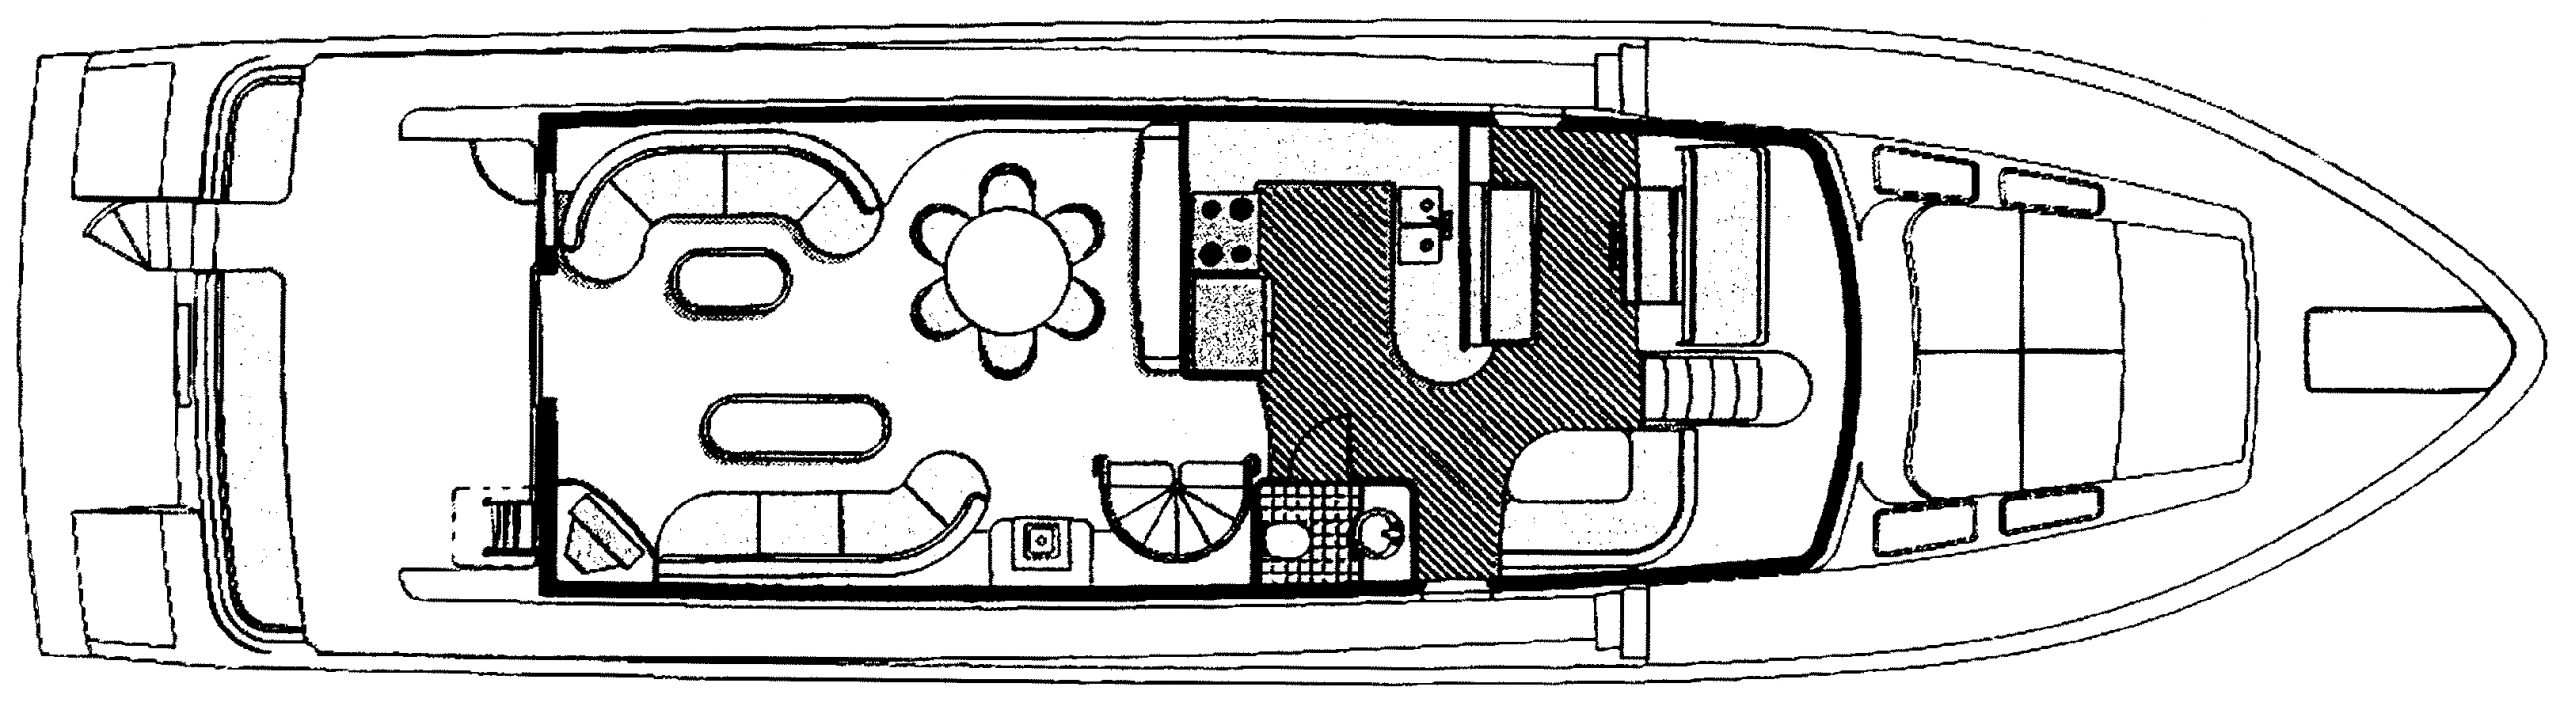 81 Sport Yacht Floor Plan 2